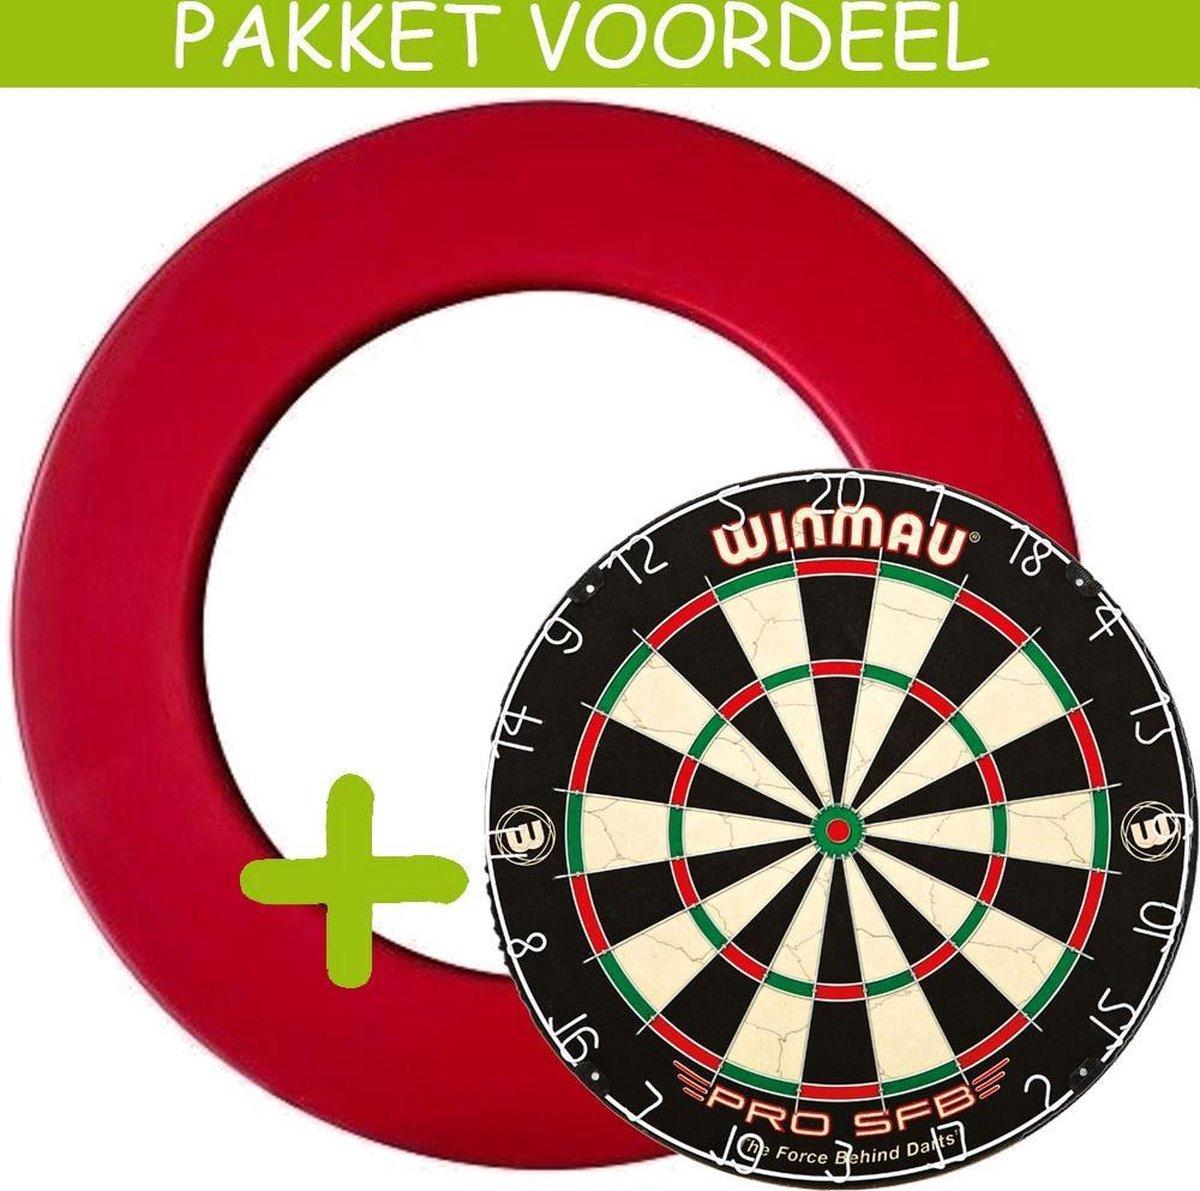 Dartbord Surround VoordeelPakket - Pro SFB - Rubberen Surround-- (Rood)